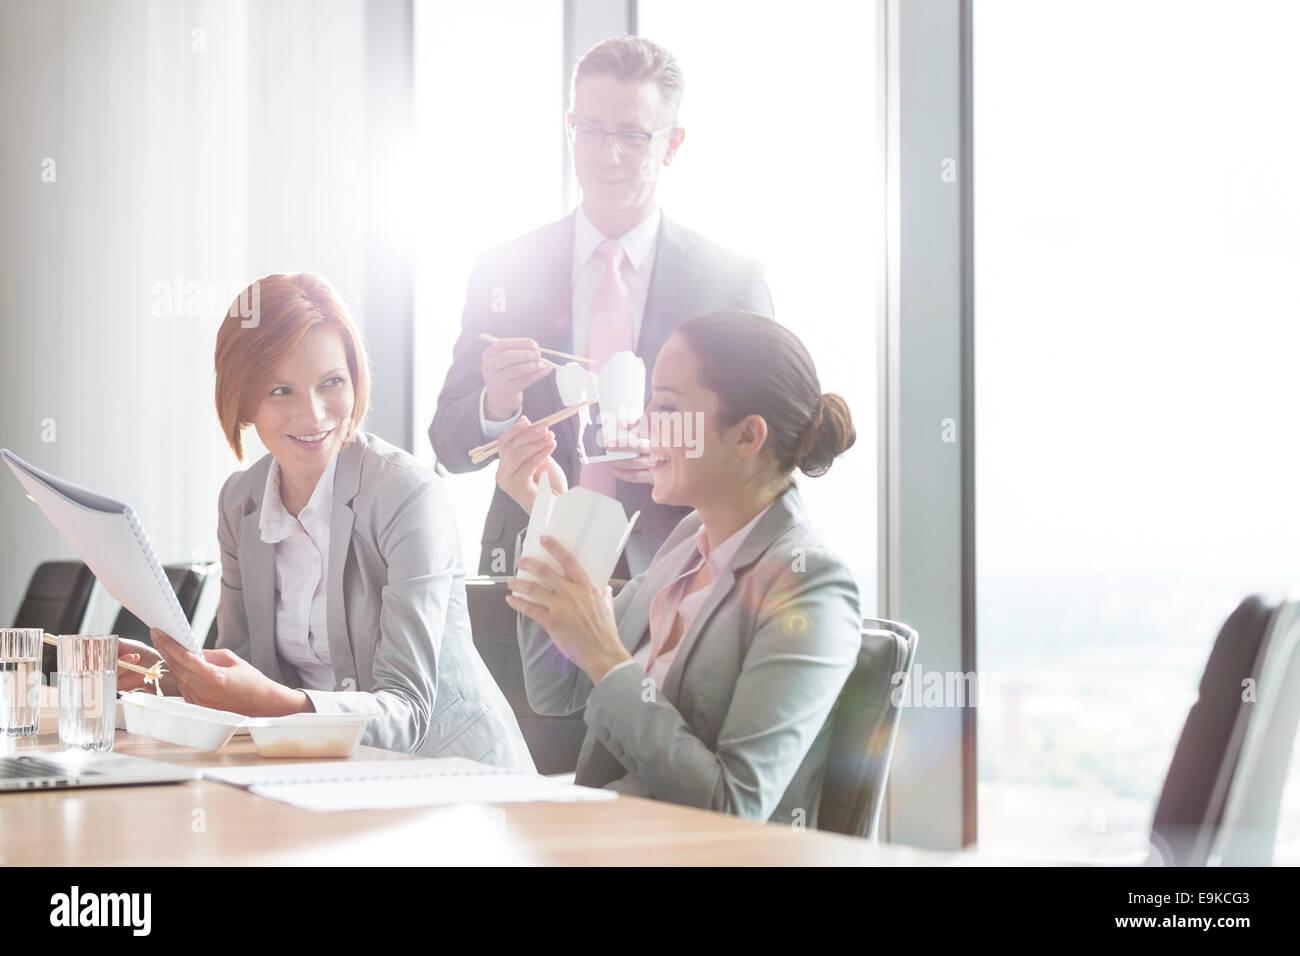 Business people having lunch break - Stock Image